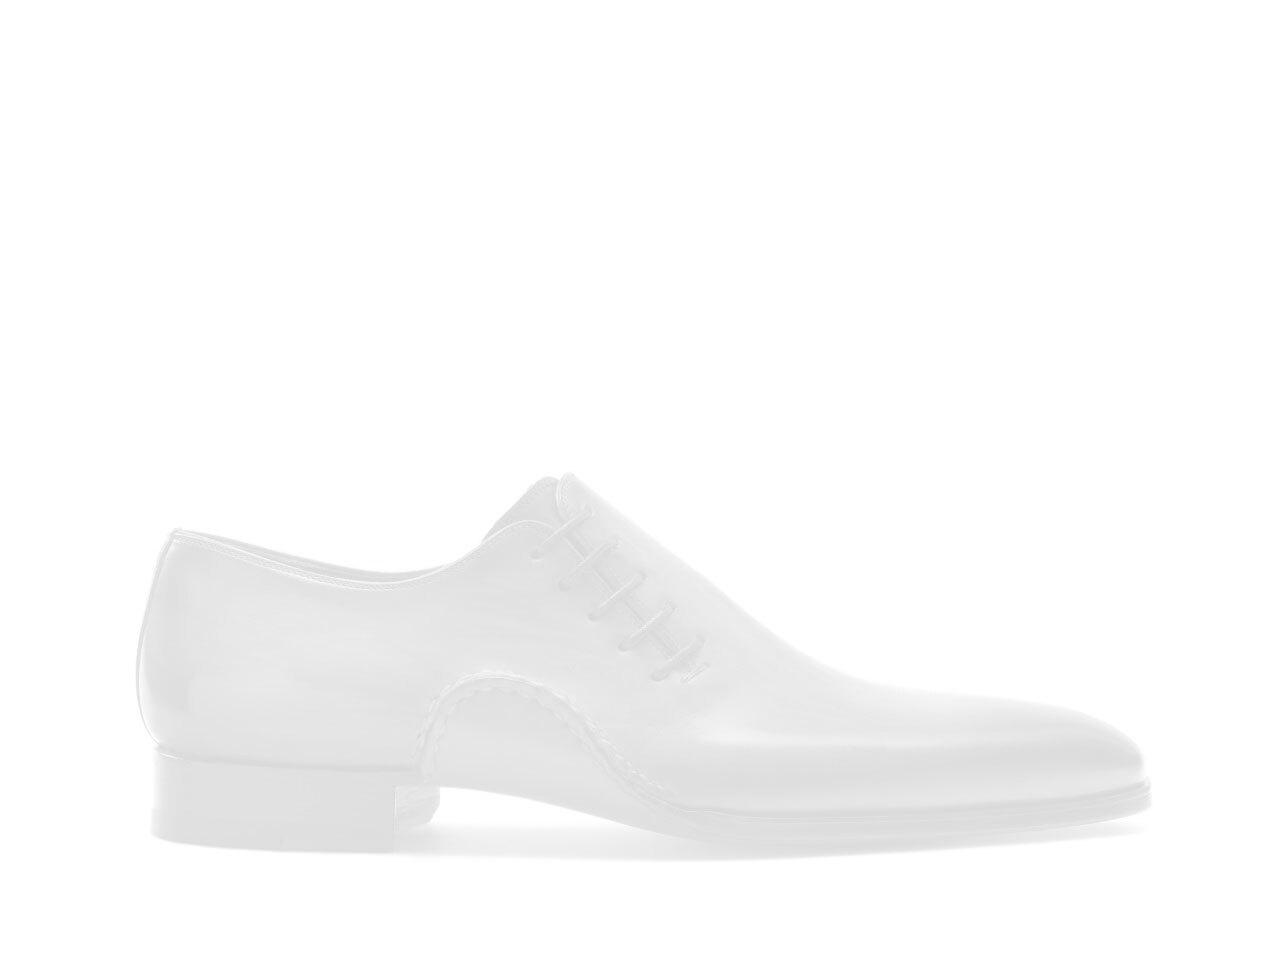 Side view of the Magnanni Marbella Cuero Men's Loafers